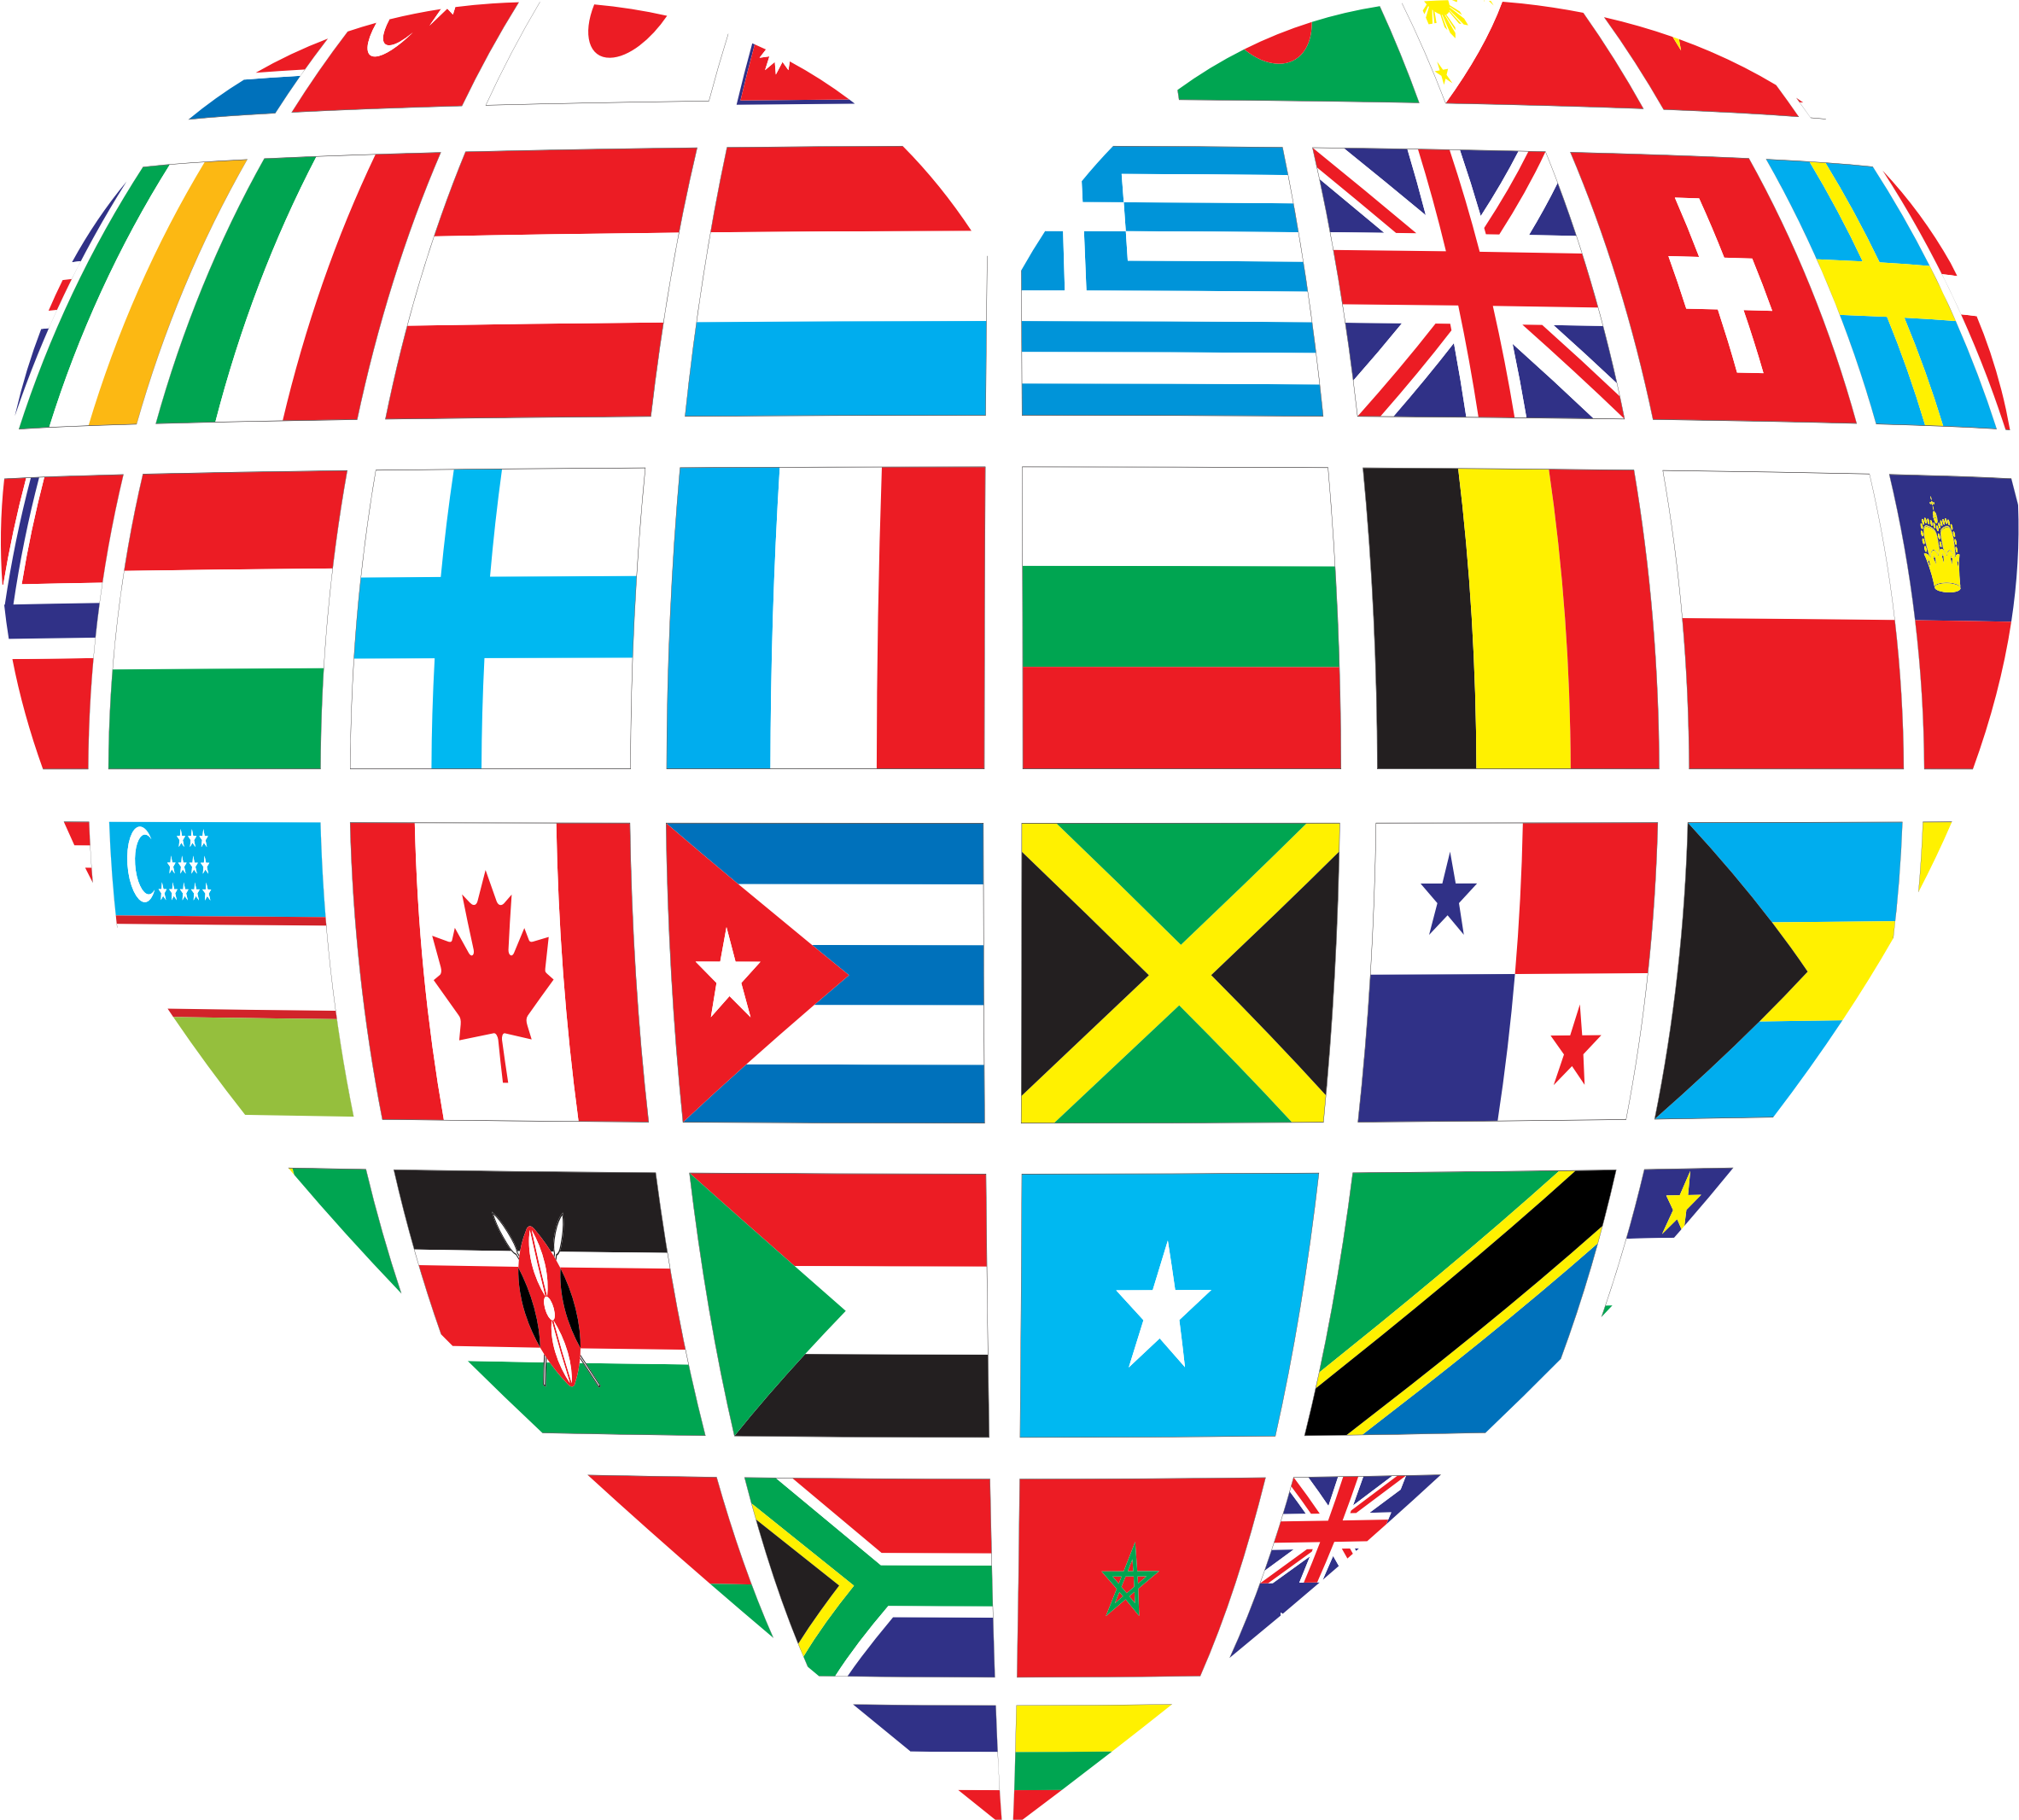 Heart world clipart image freeuse stock Clipart - Global Heart image freeuse stock